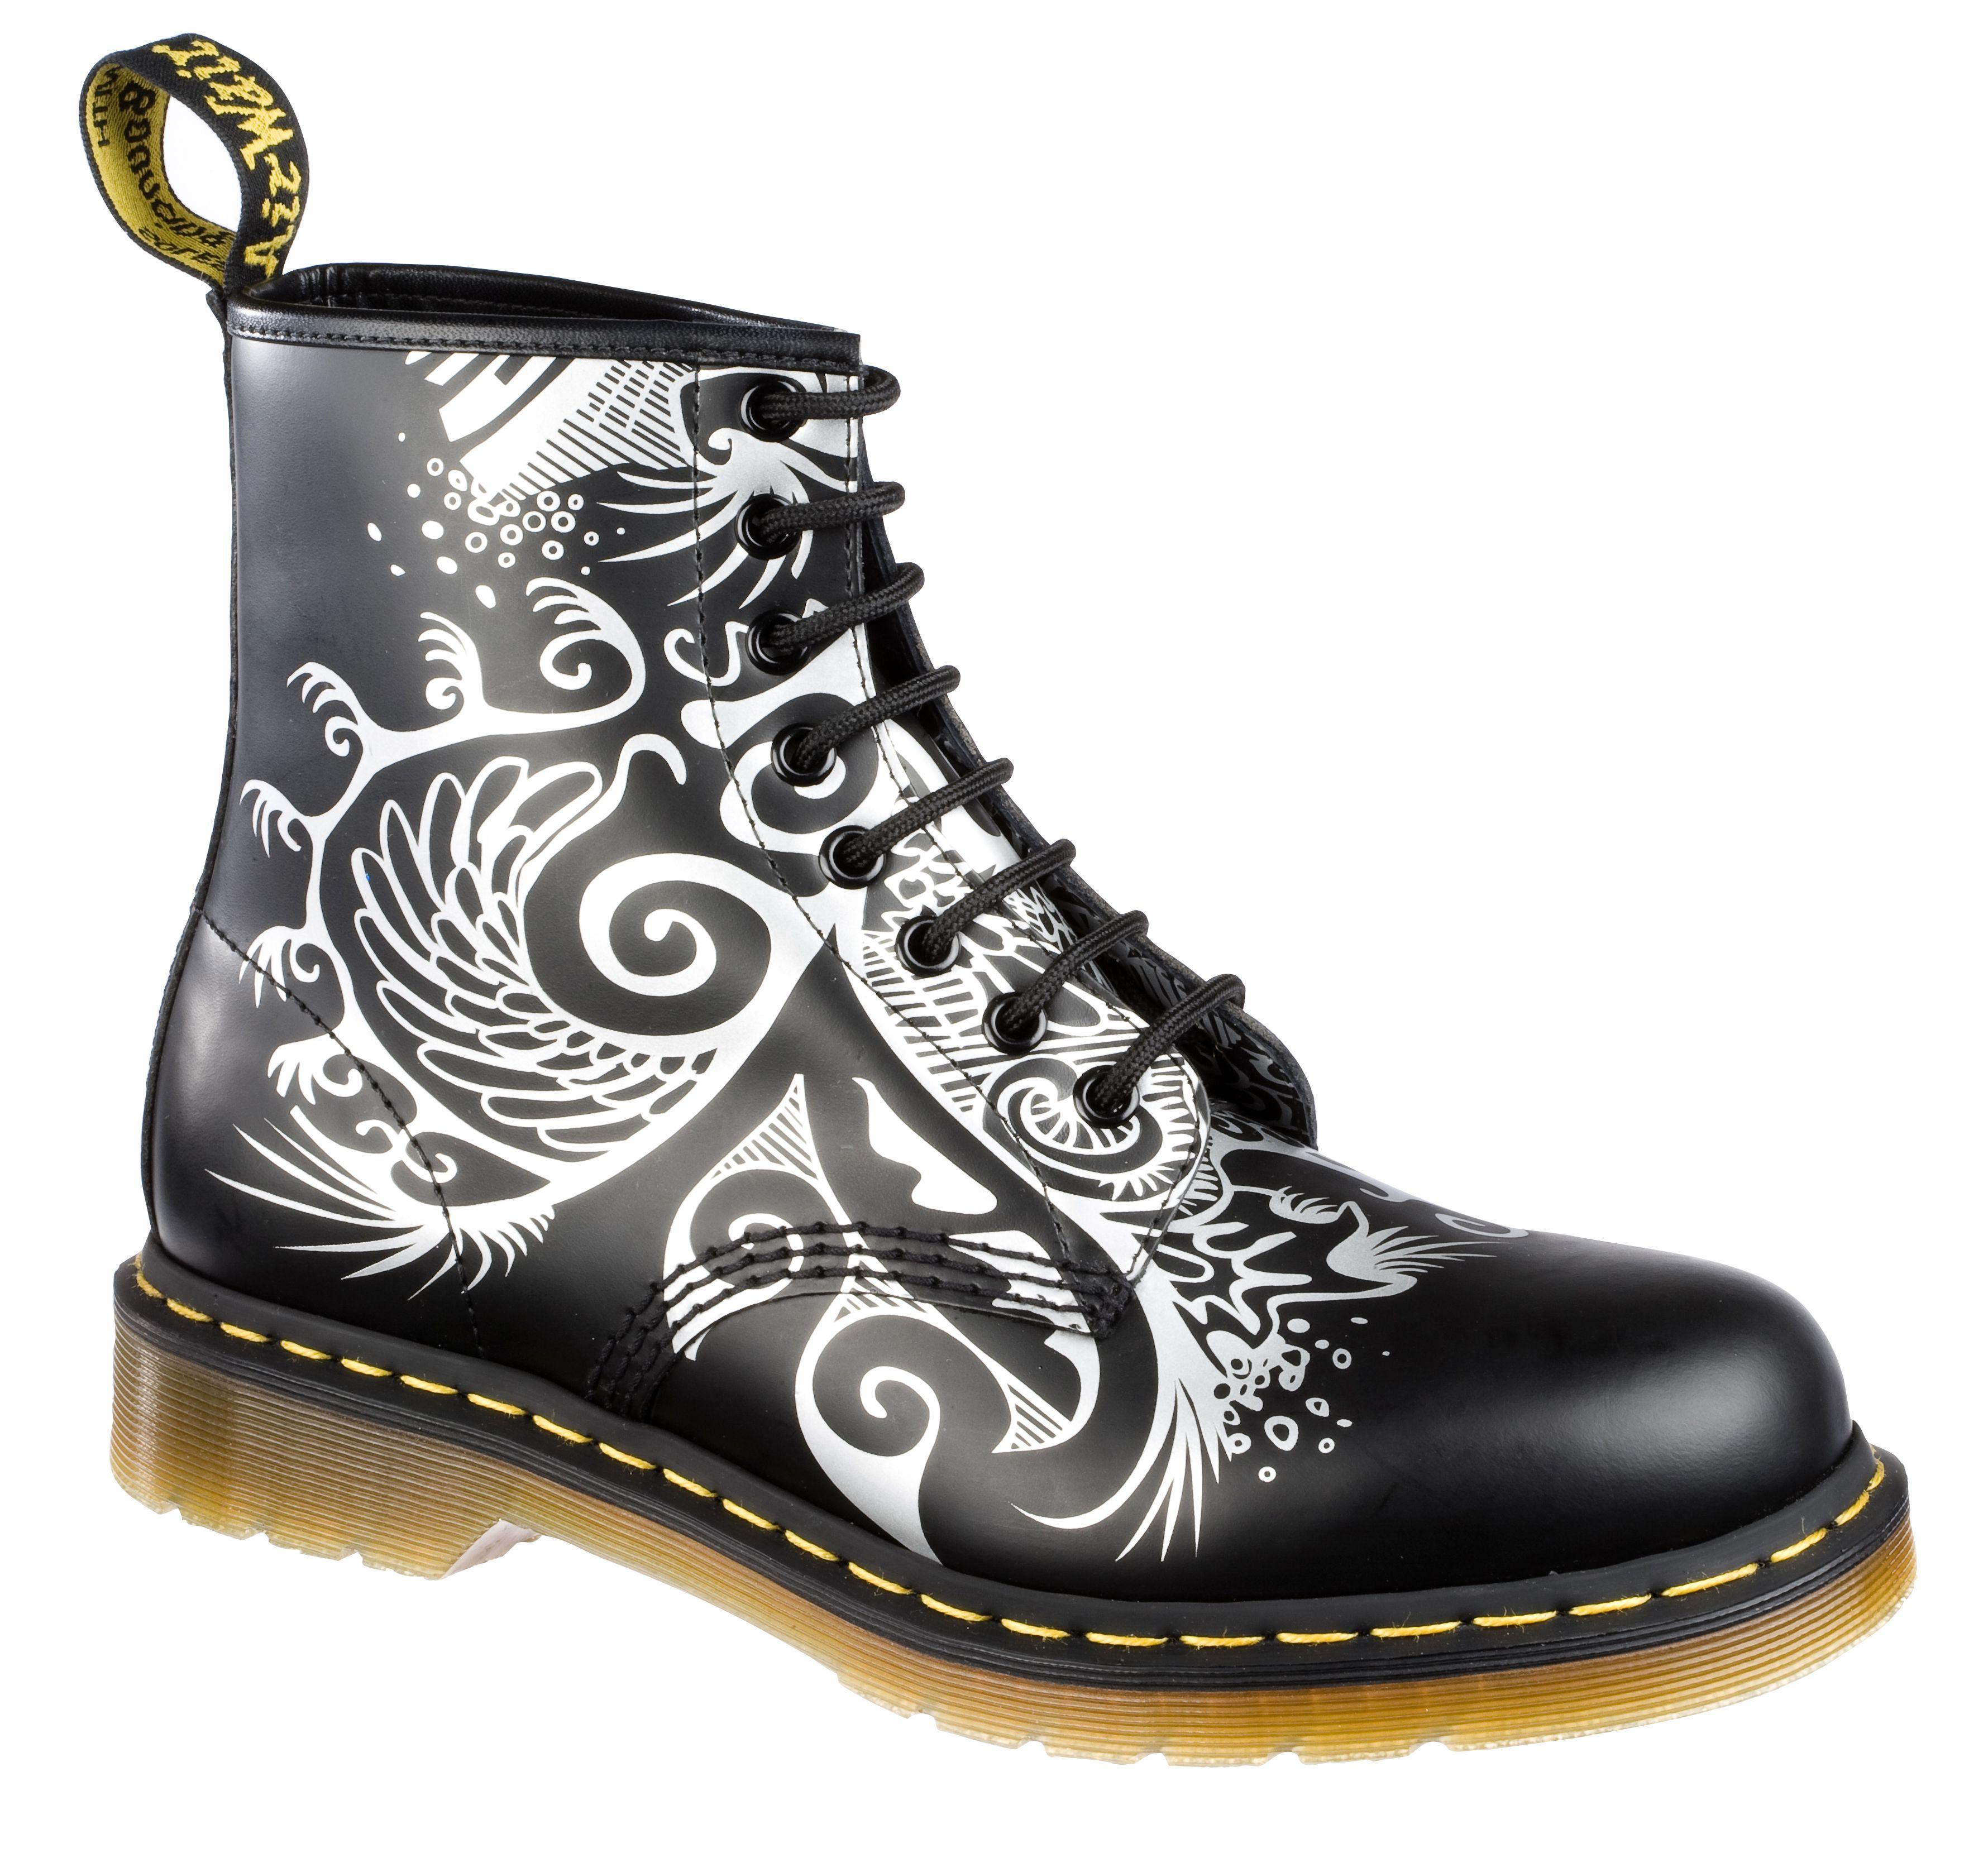 16c593aa7e3b Customised Dr. Marten 1460 Boot